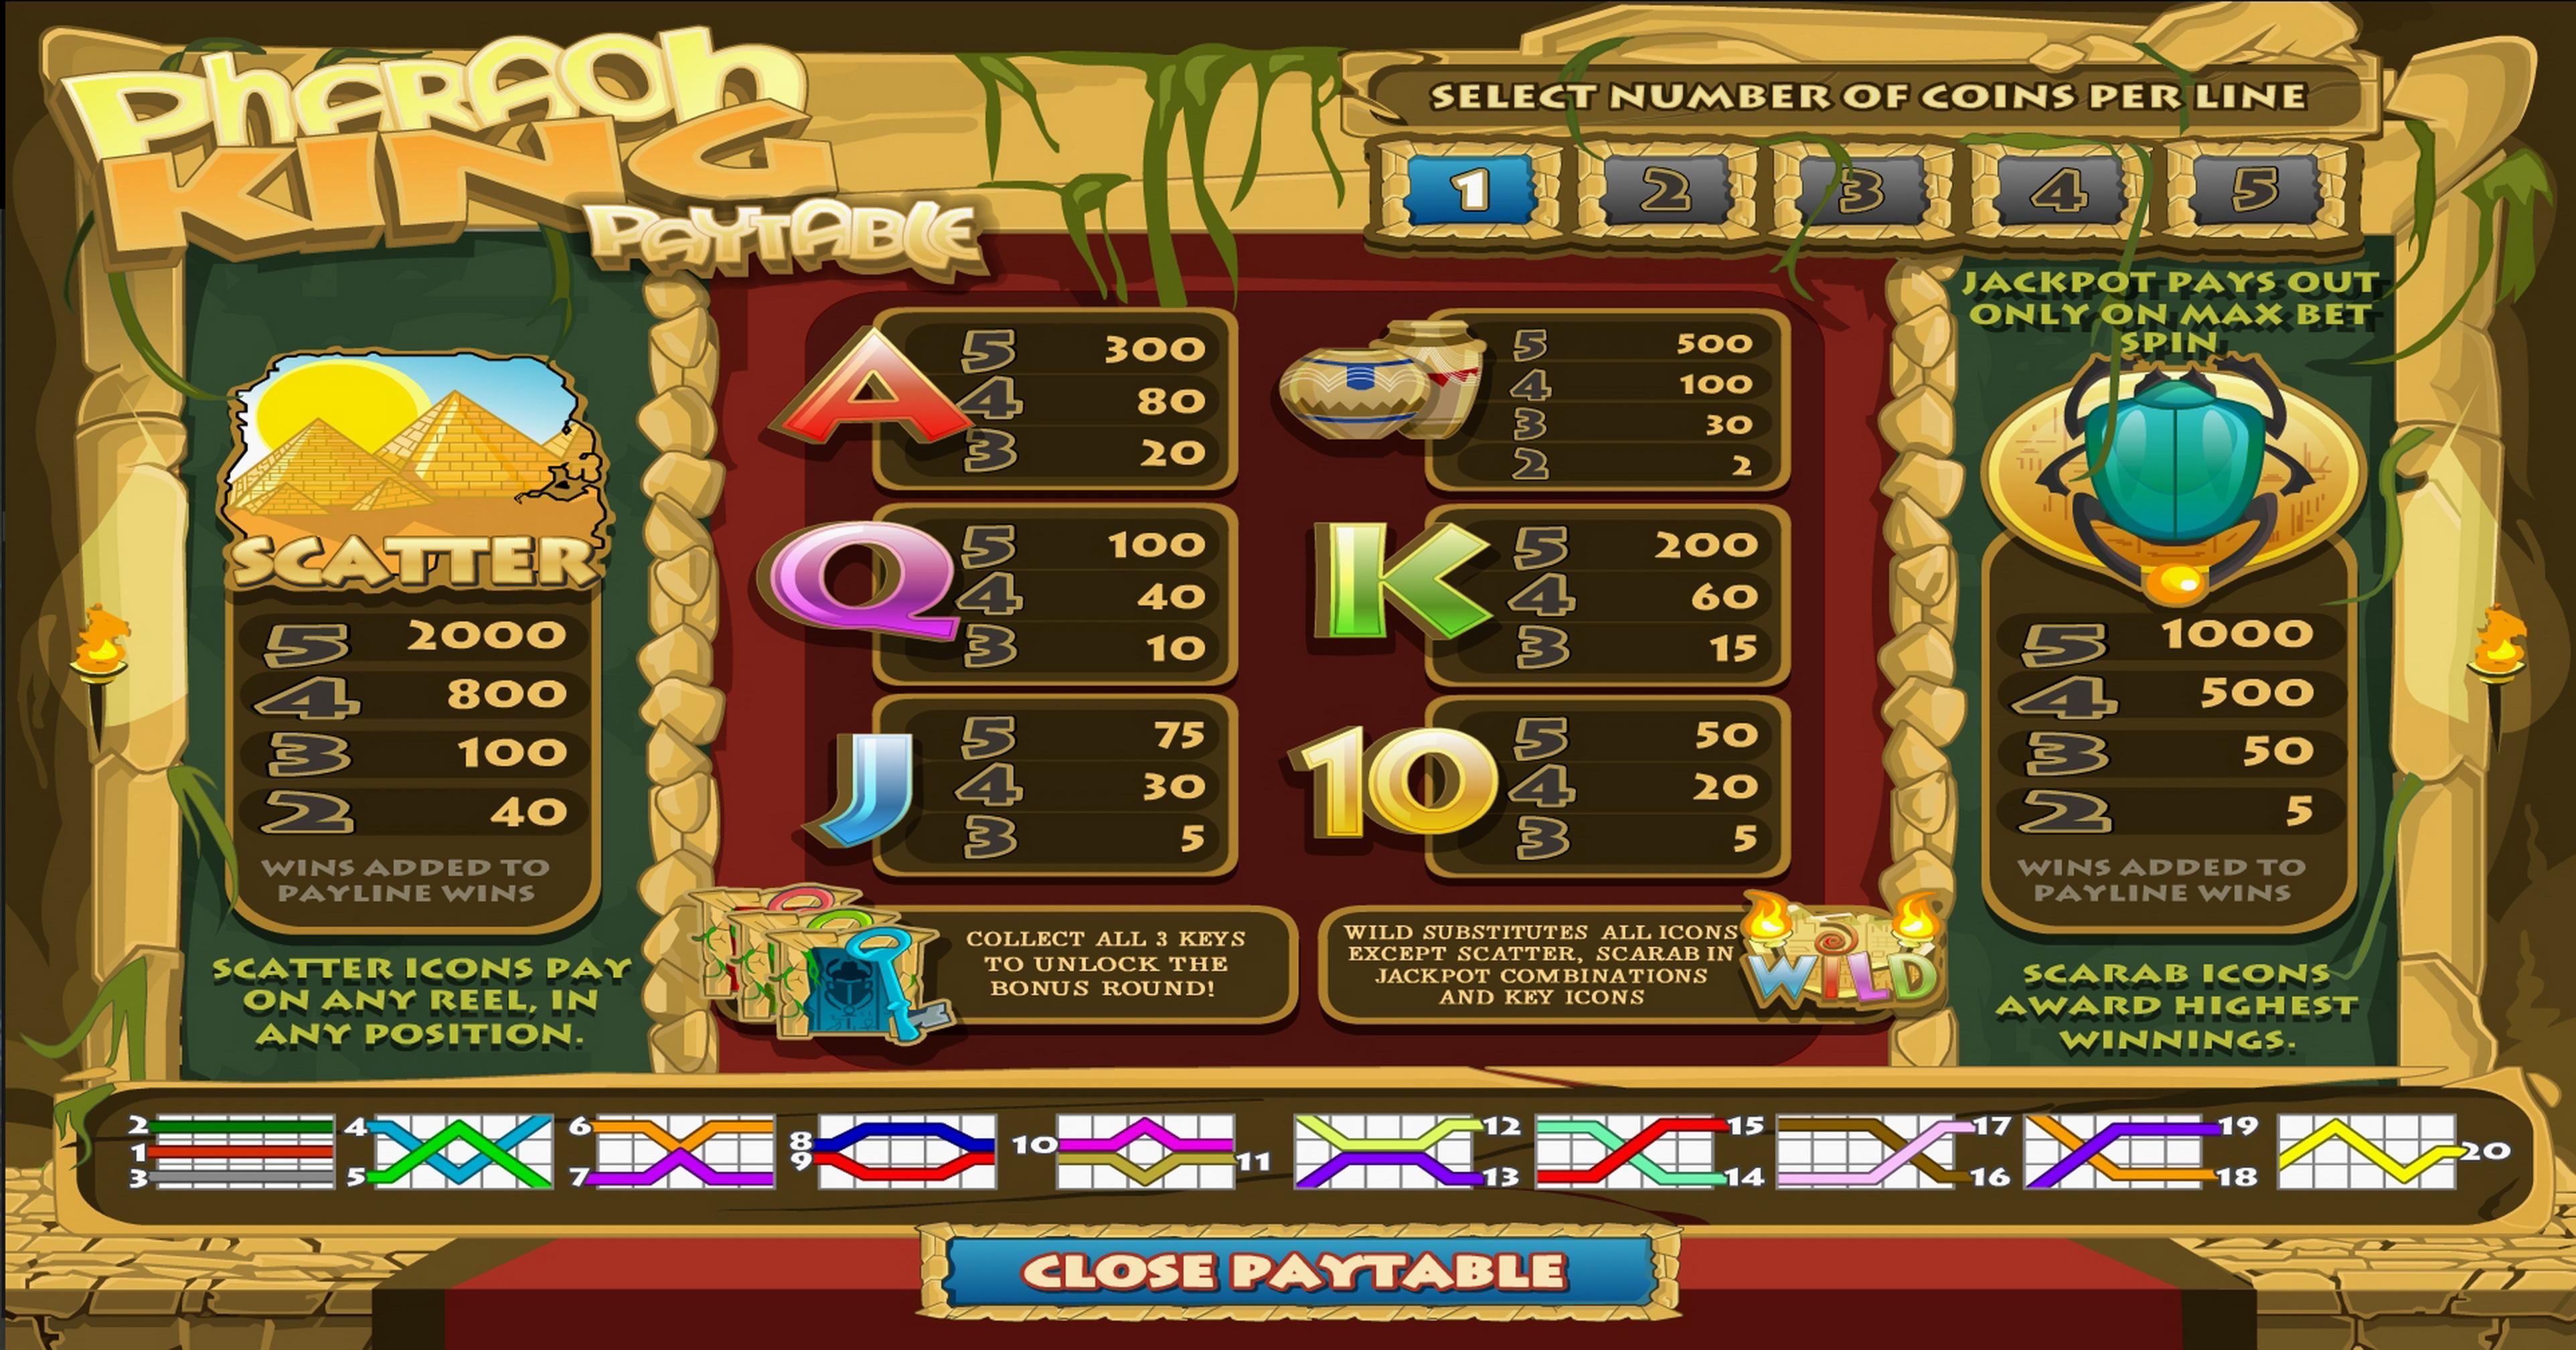 Online casino register free credit